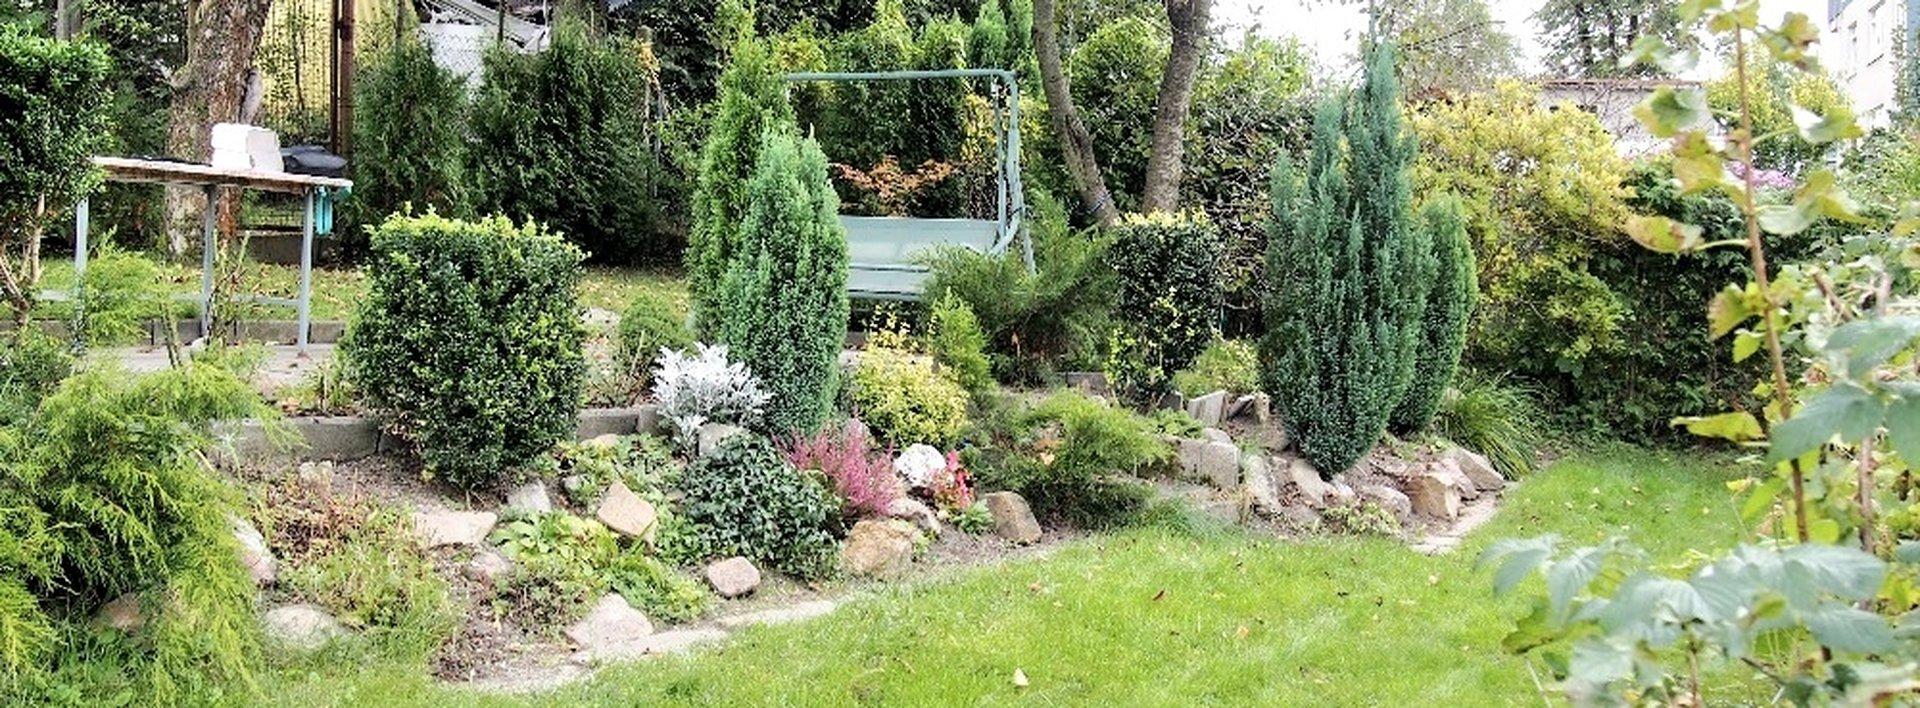 Prodej zahrady, 205m² - Liberec, Ev.č.: N47866